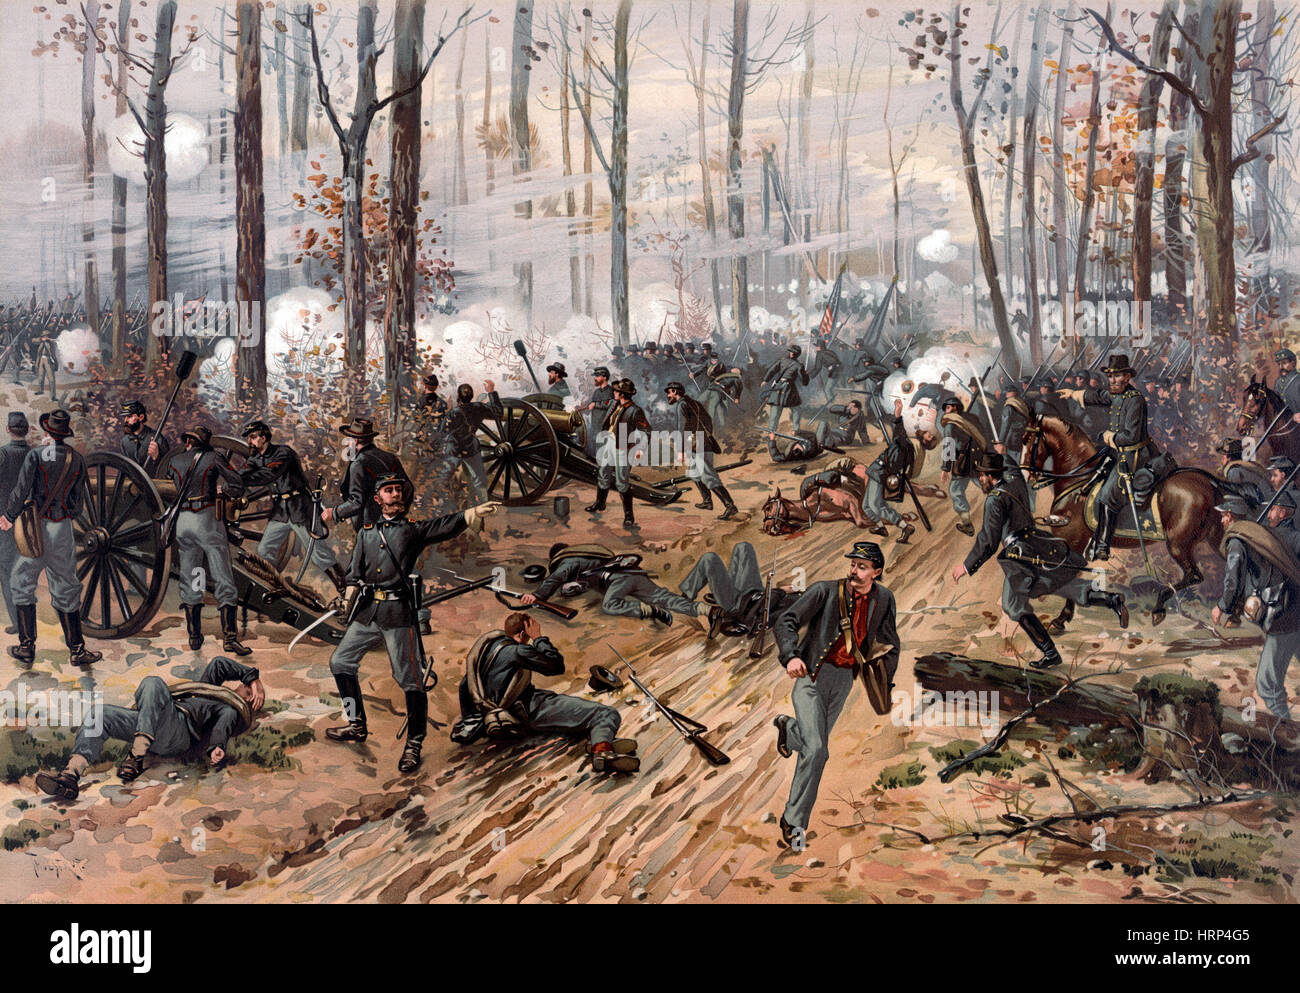 American Civil War, Battle of Shiloh, 1862 - Stock Image